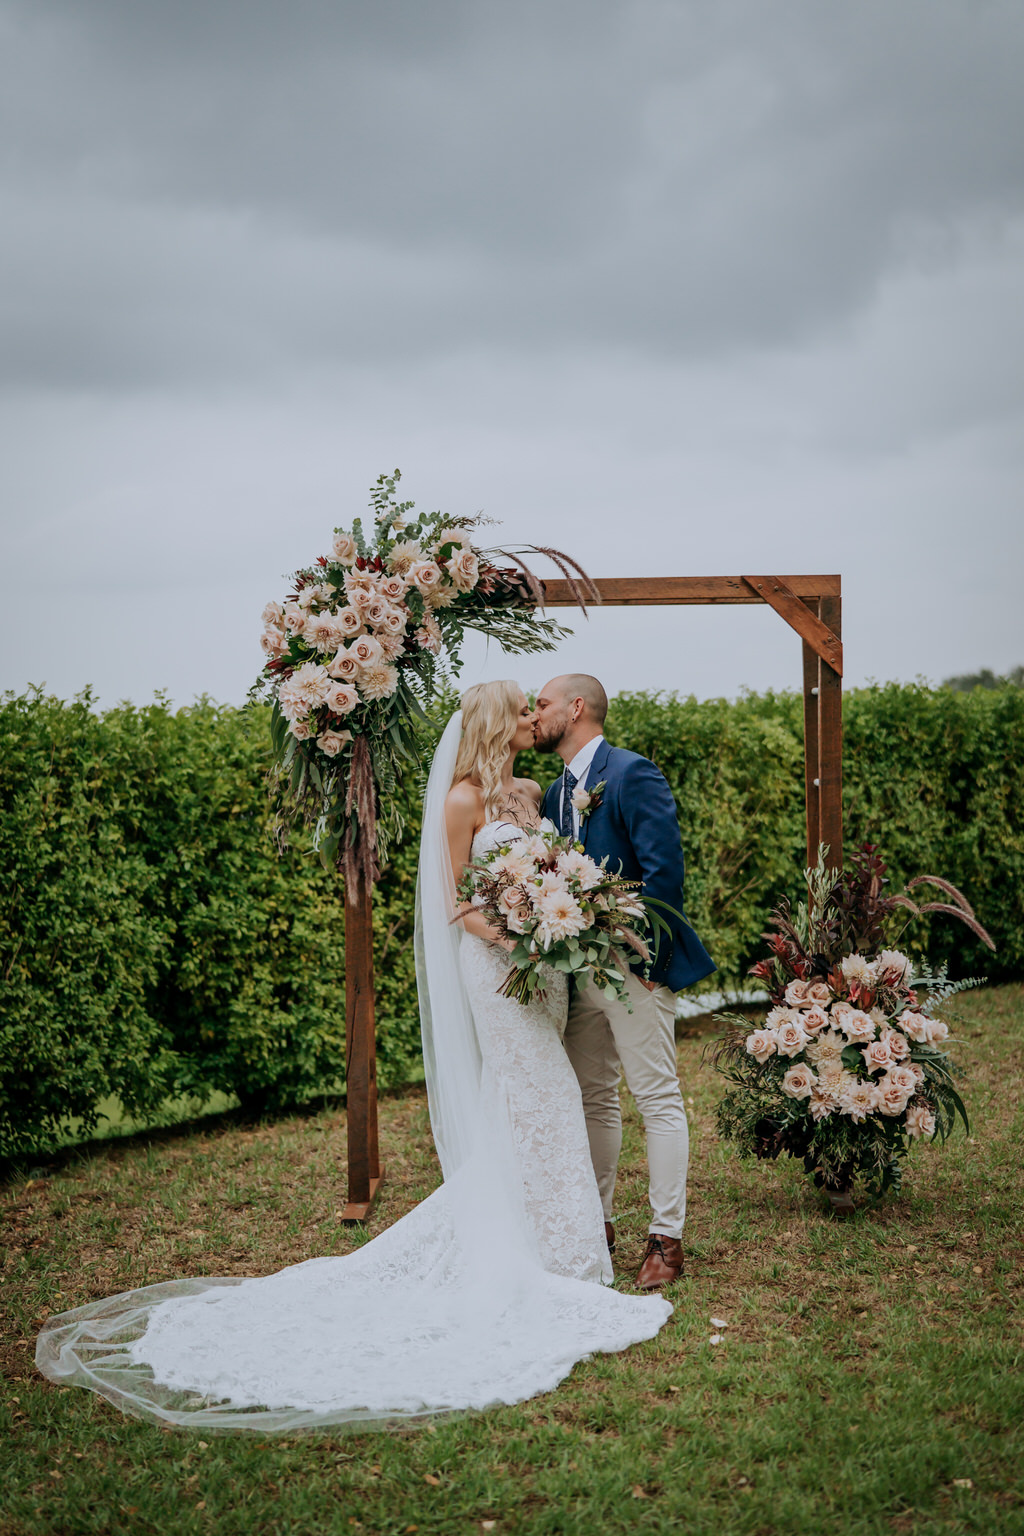 ava-me-photography-jade-simon-loxley-bellbird-hill-kurrajong-heights-wedding-609